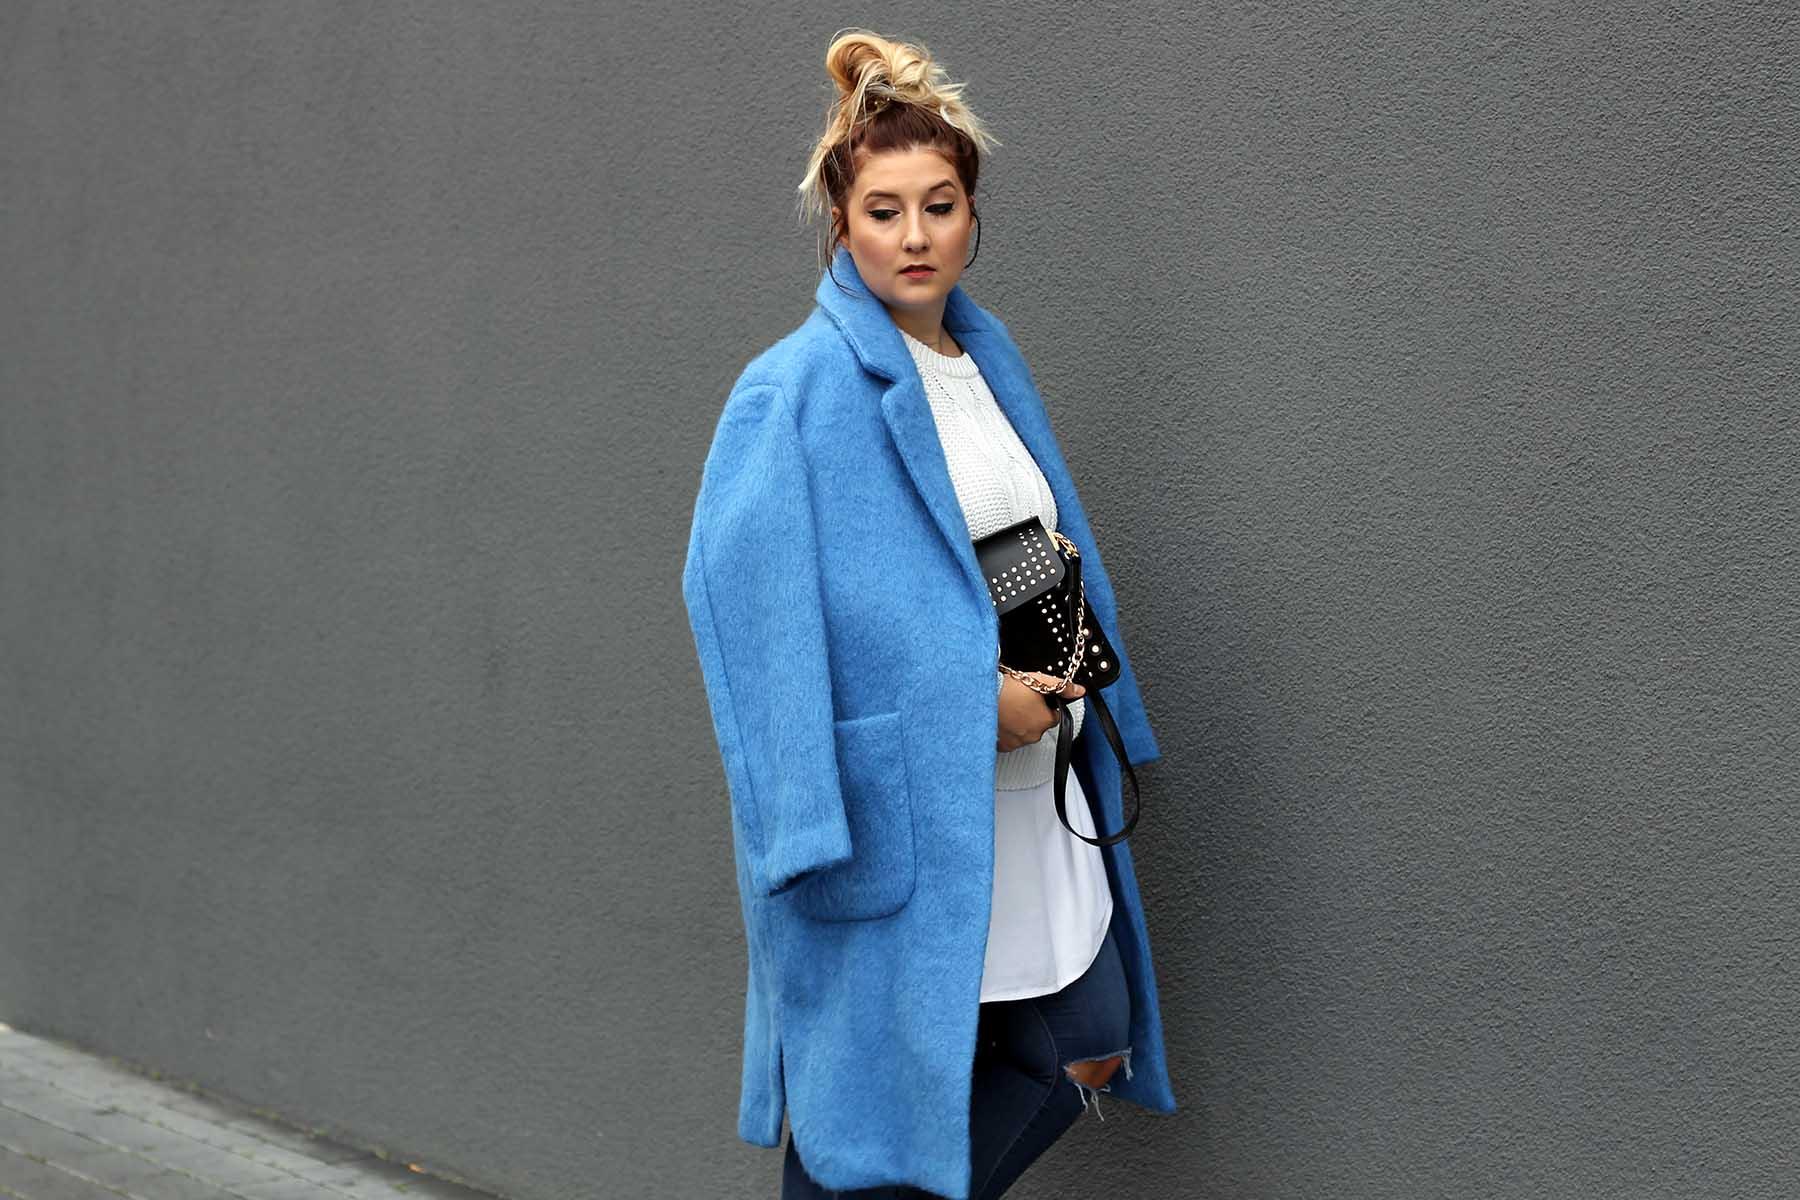 outfit-look-style-modeblog-fashionblog-blauer-mantel-jeans-balenciaga-lookalike-boots-chloe25